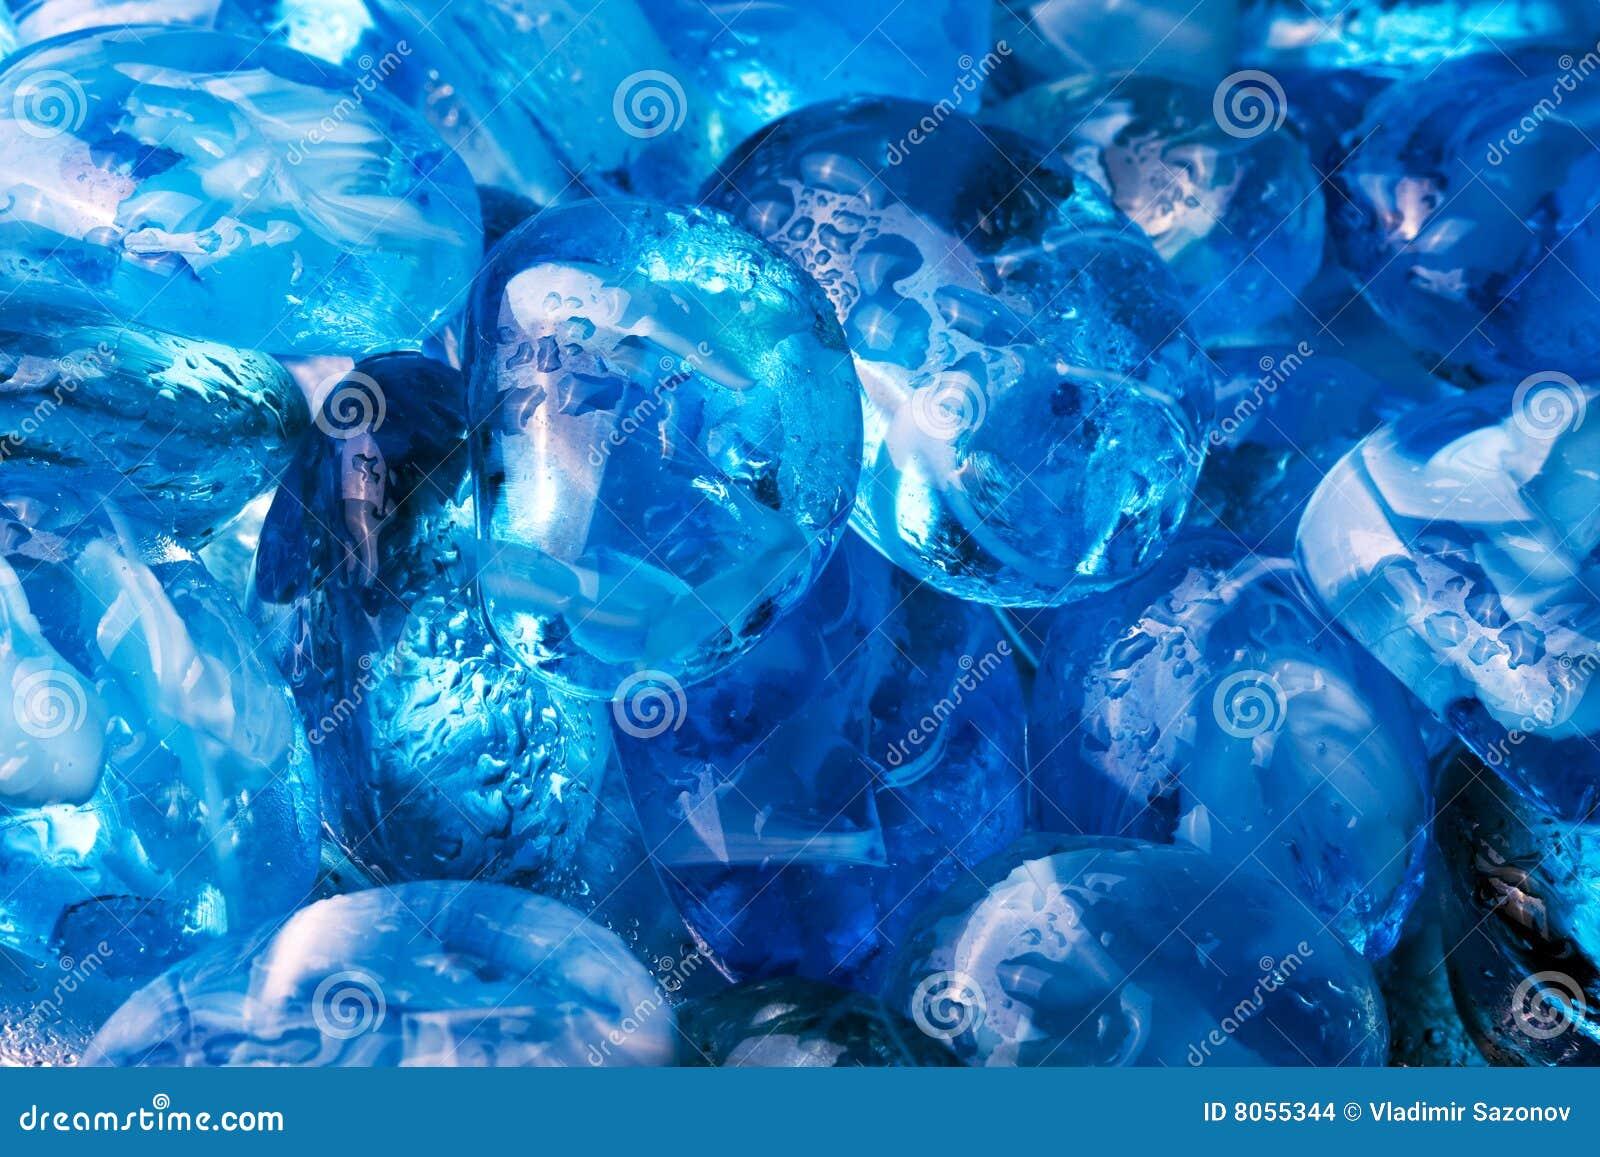 magic blue stone stock images image 8055344. Black Bedroom Furniture Sets. Home Design Ideas